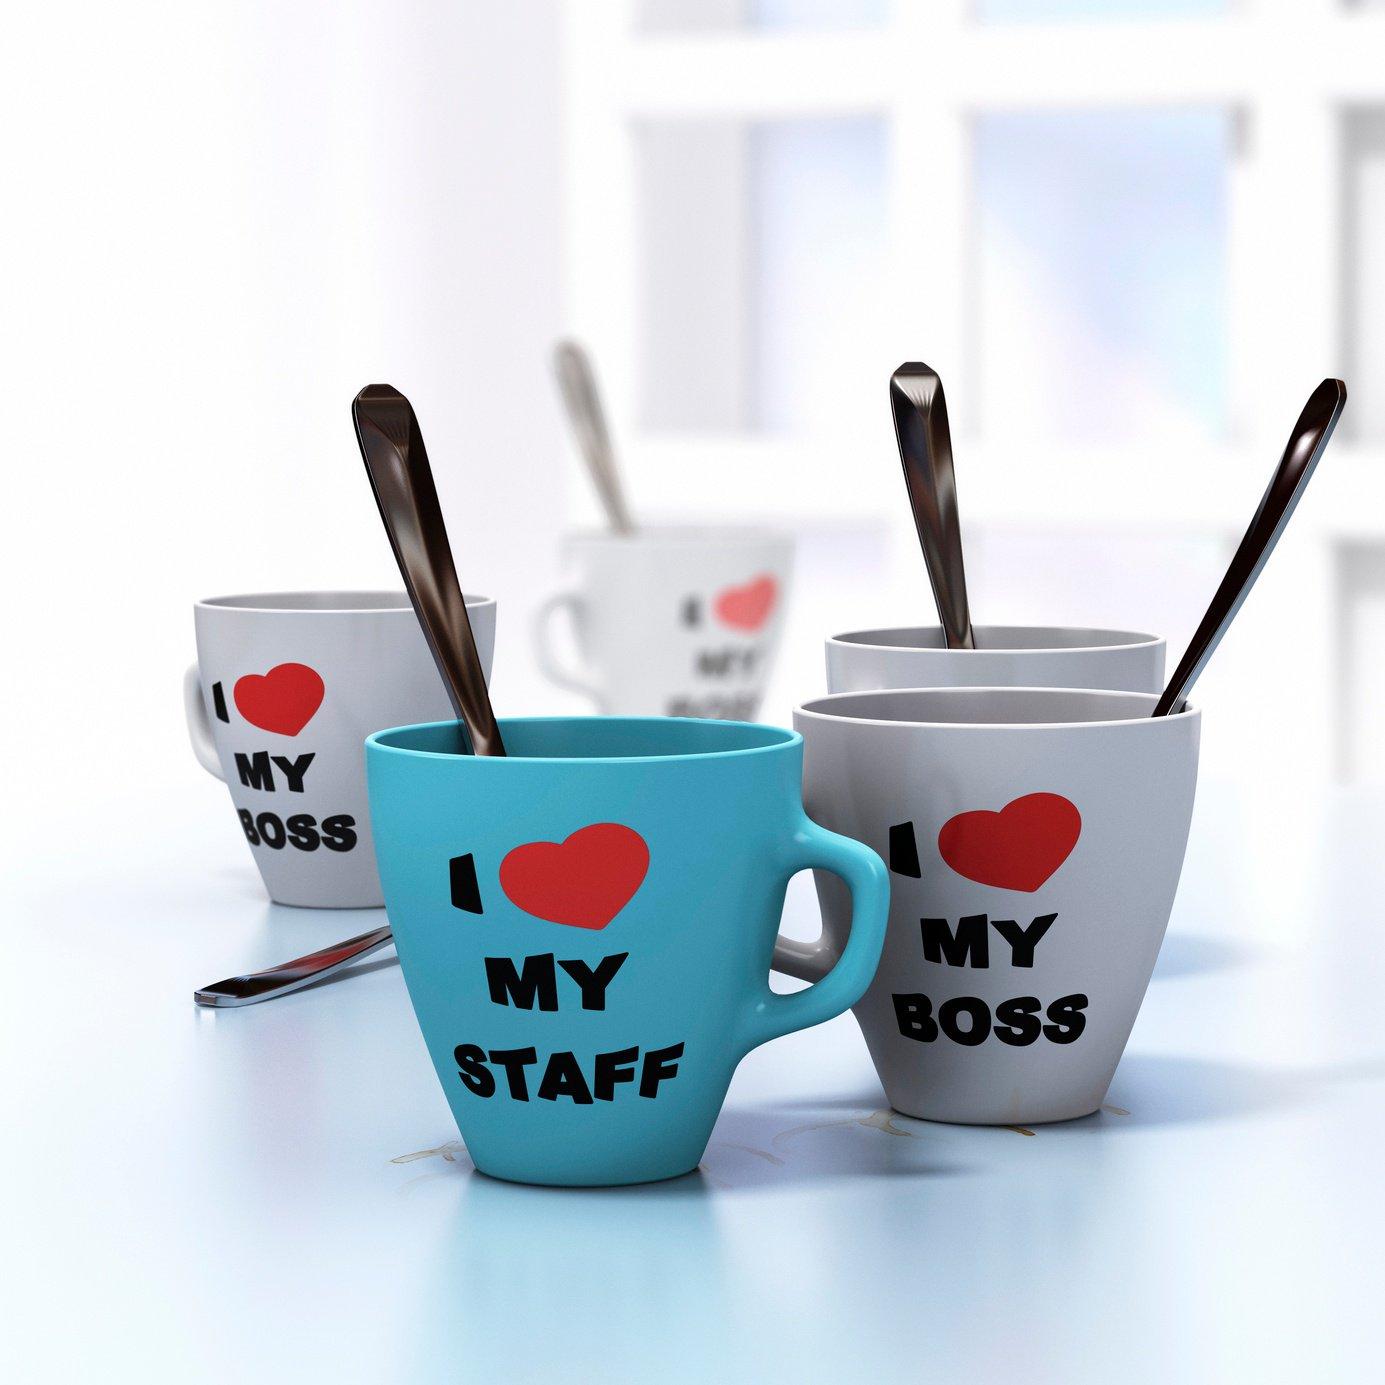 I_love_my_boss.jpg